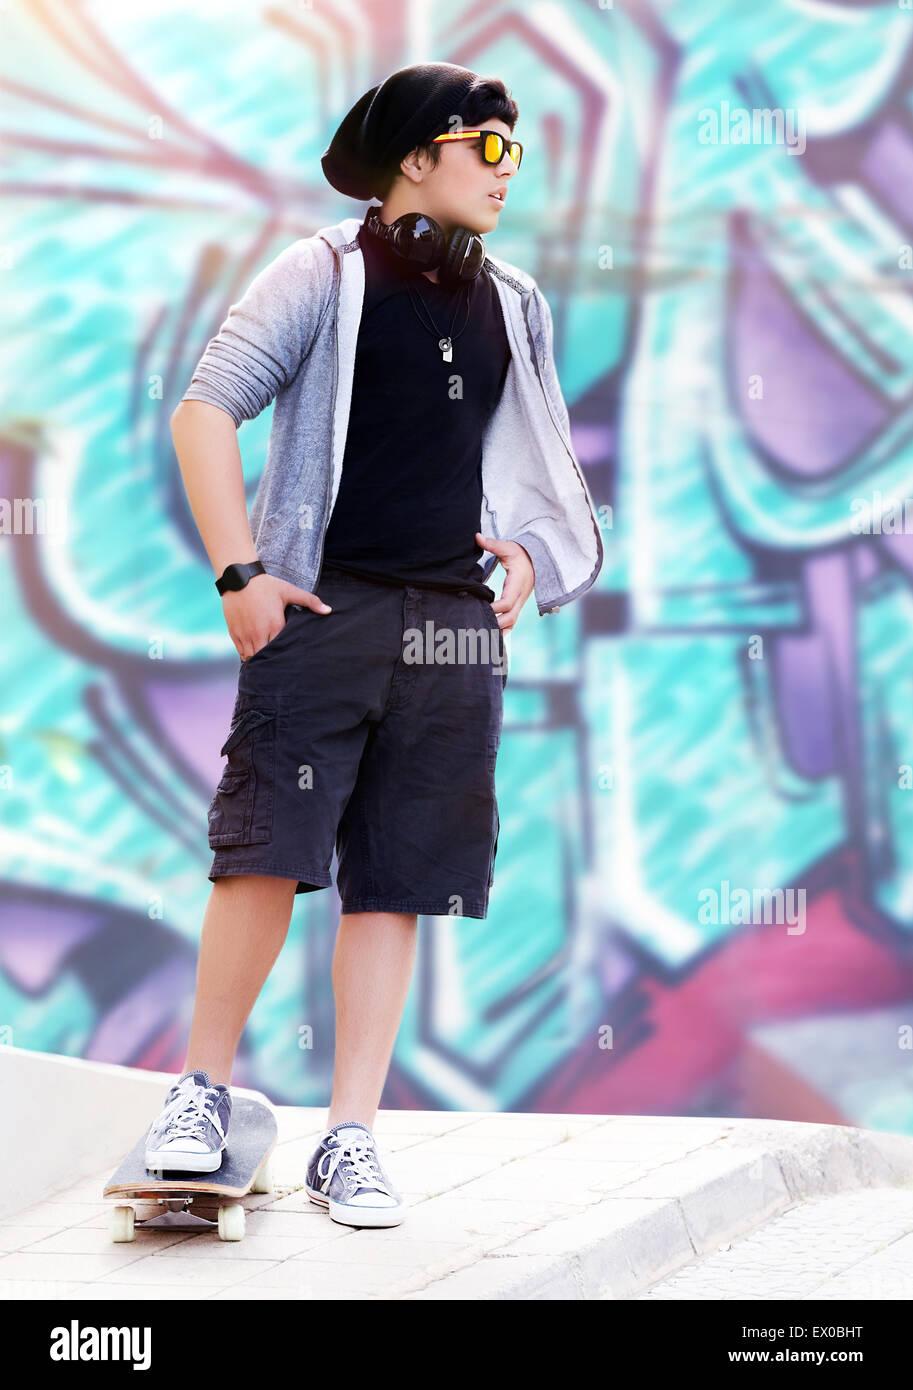 49d708398ea Stylish skater boy listening music standing outdoors on beautiful graffiti  wall background